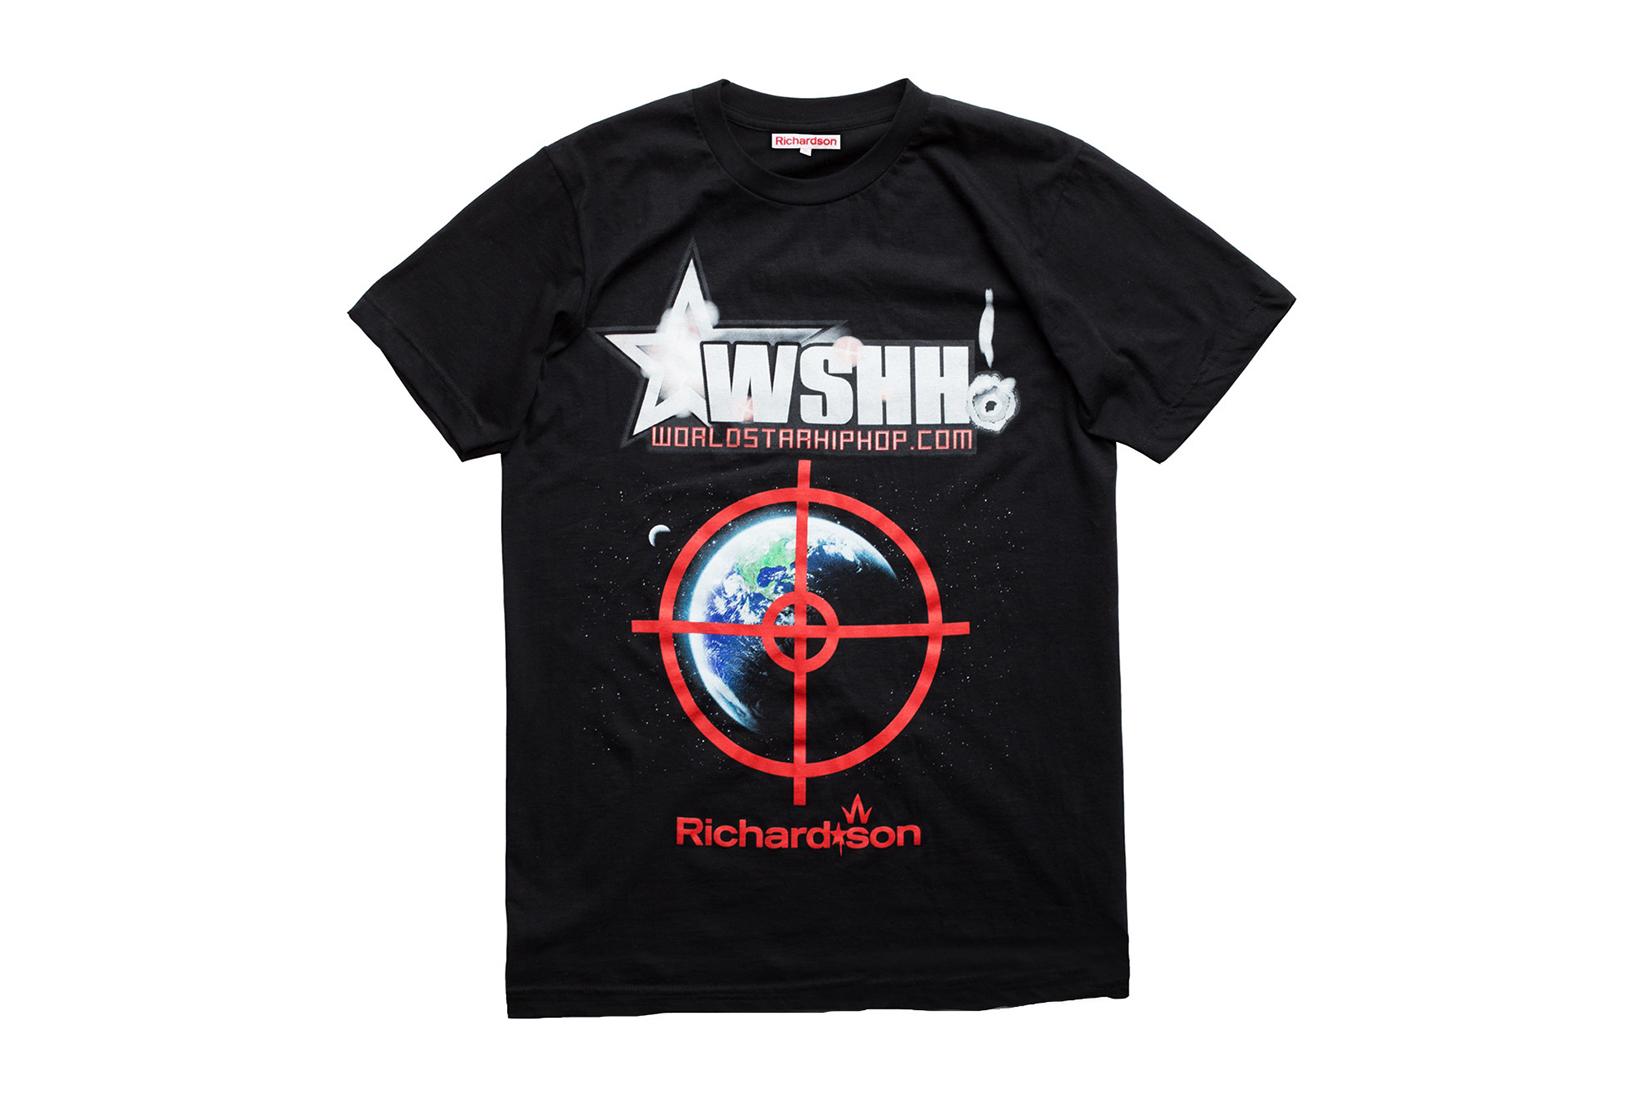 'Richardson Magazine' Joins Forces With WORLDSTARHIPHOP